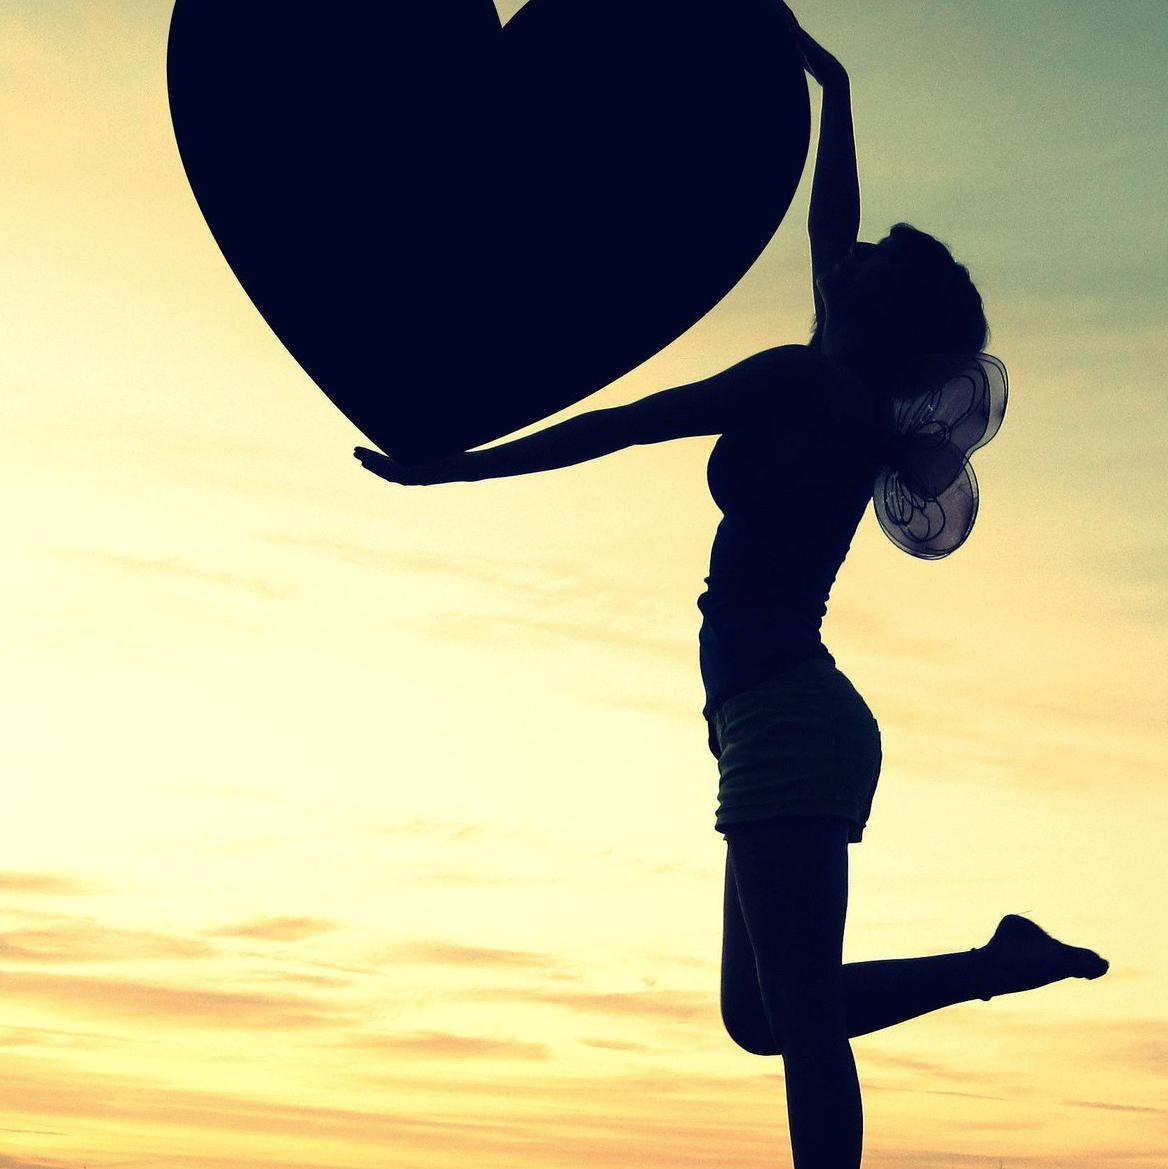 Фото на аву в контакте про любовь